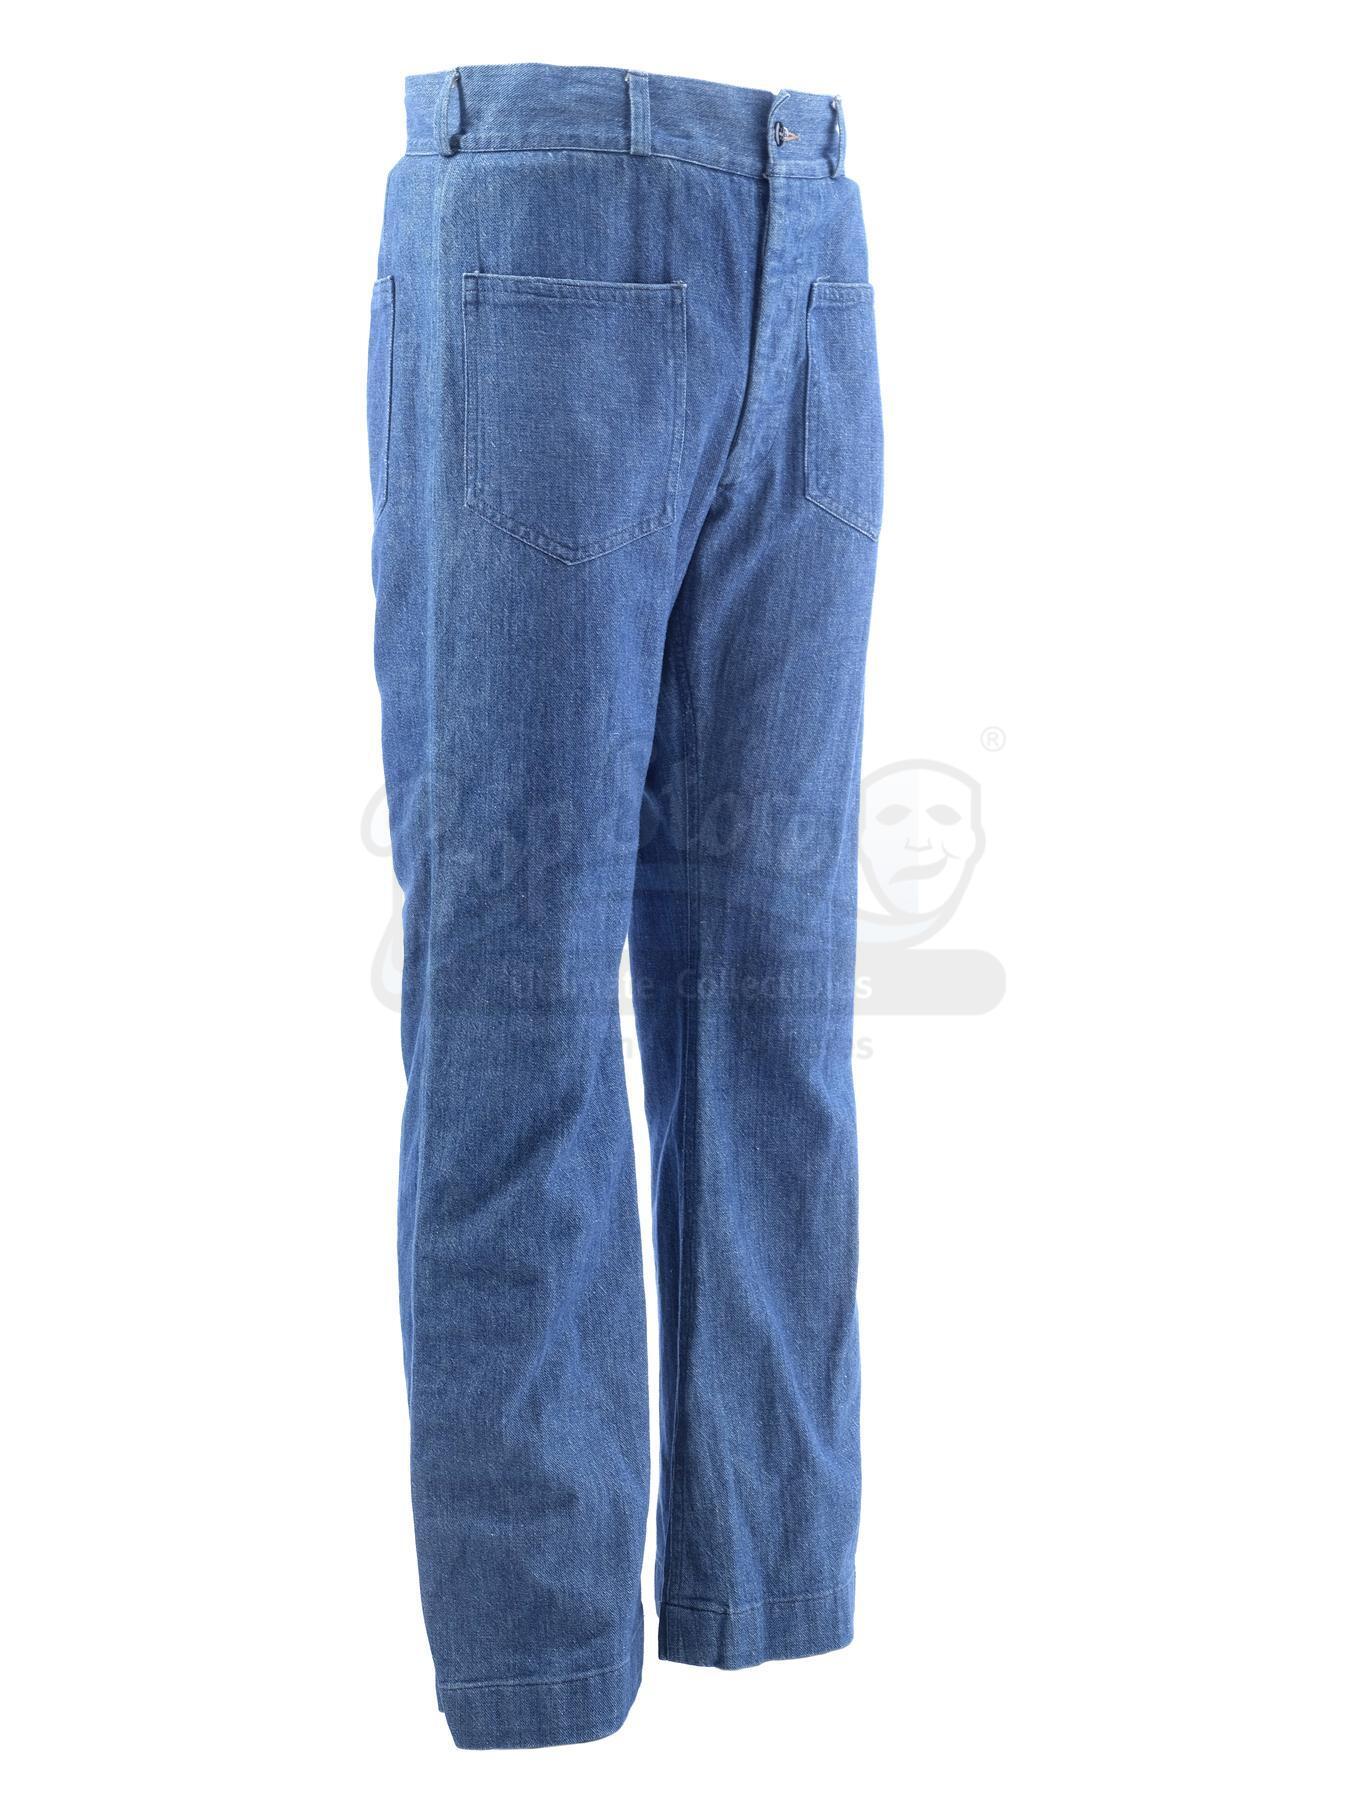 Lot # 1005: THE SAND PEBBLES - Jake Holman's (Steve McQueen) Jeans - Image 3 of 11